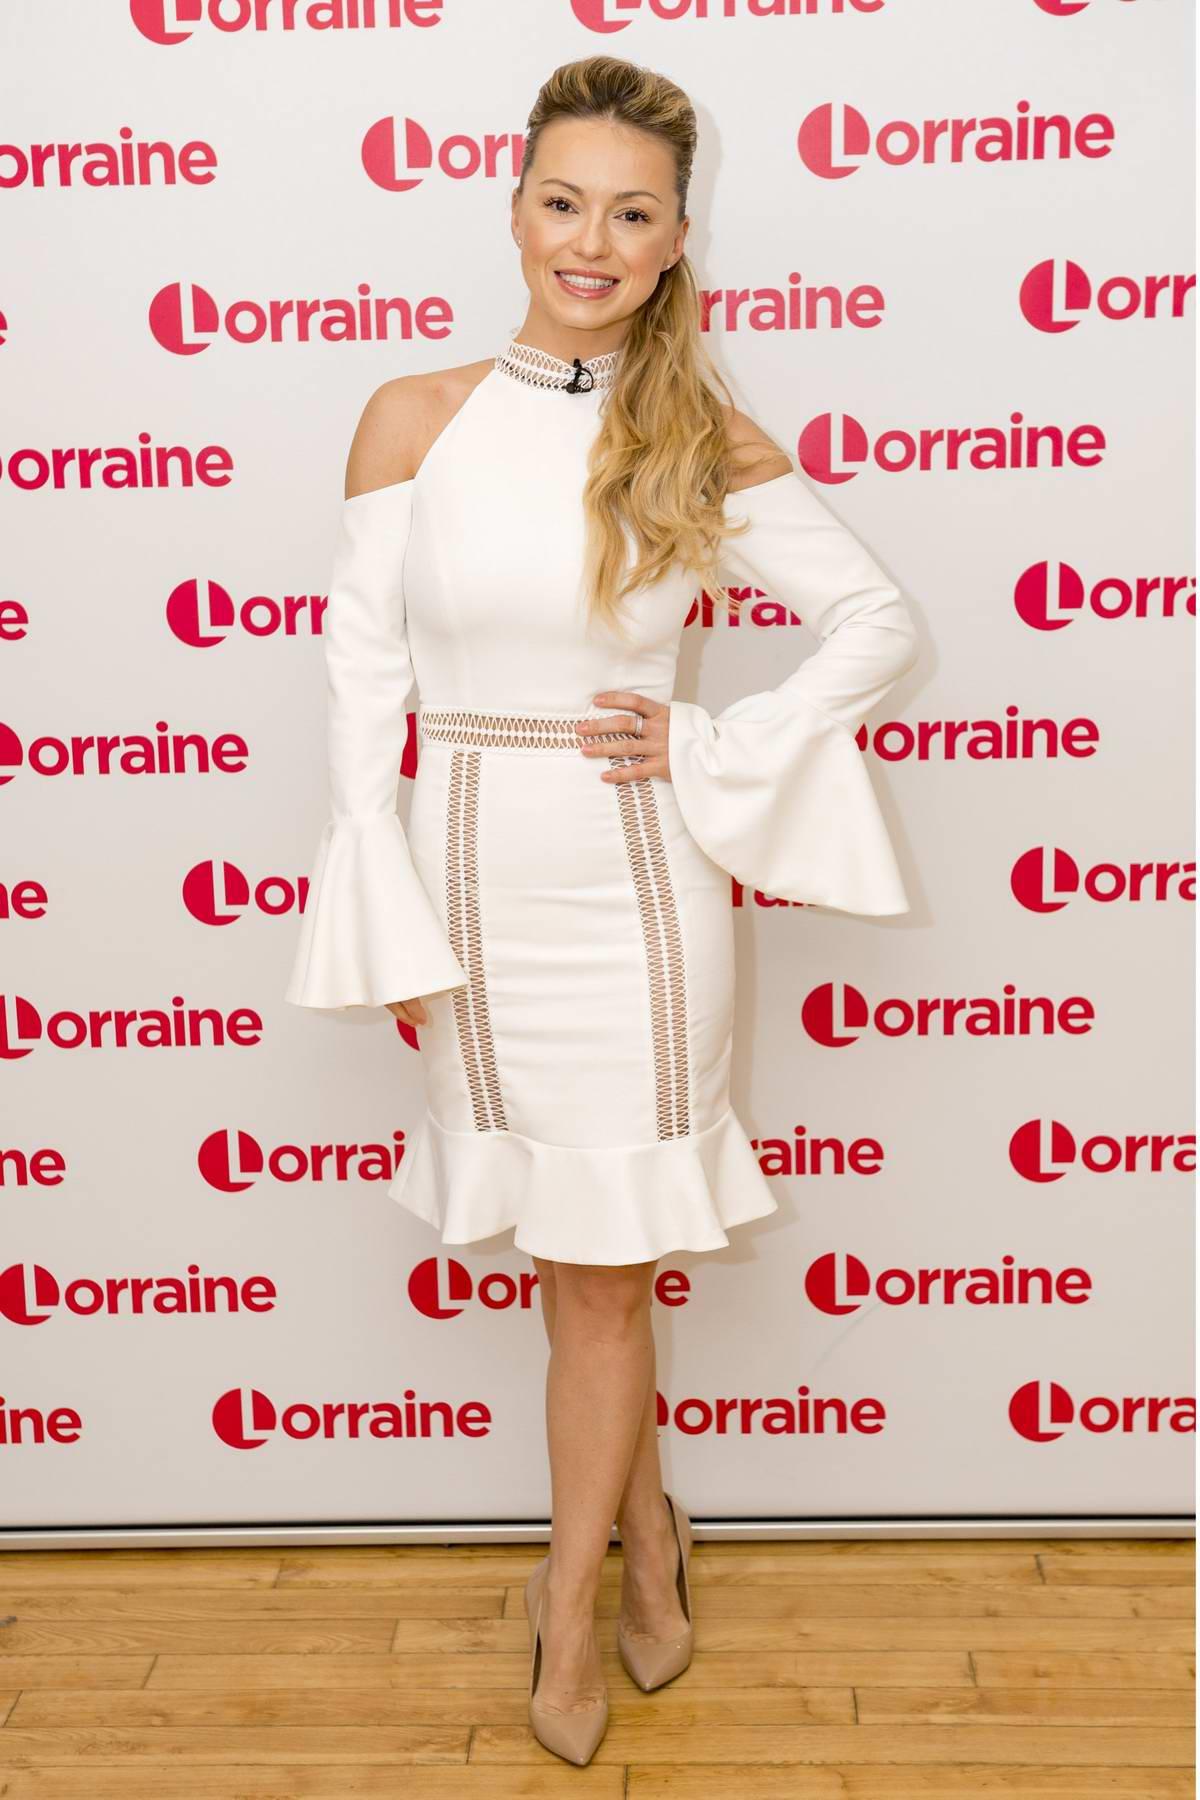 Ola Jordan makes an appearance on Lorraine TV show in London